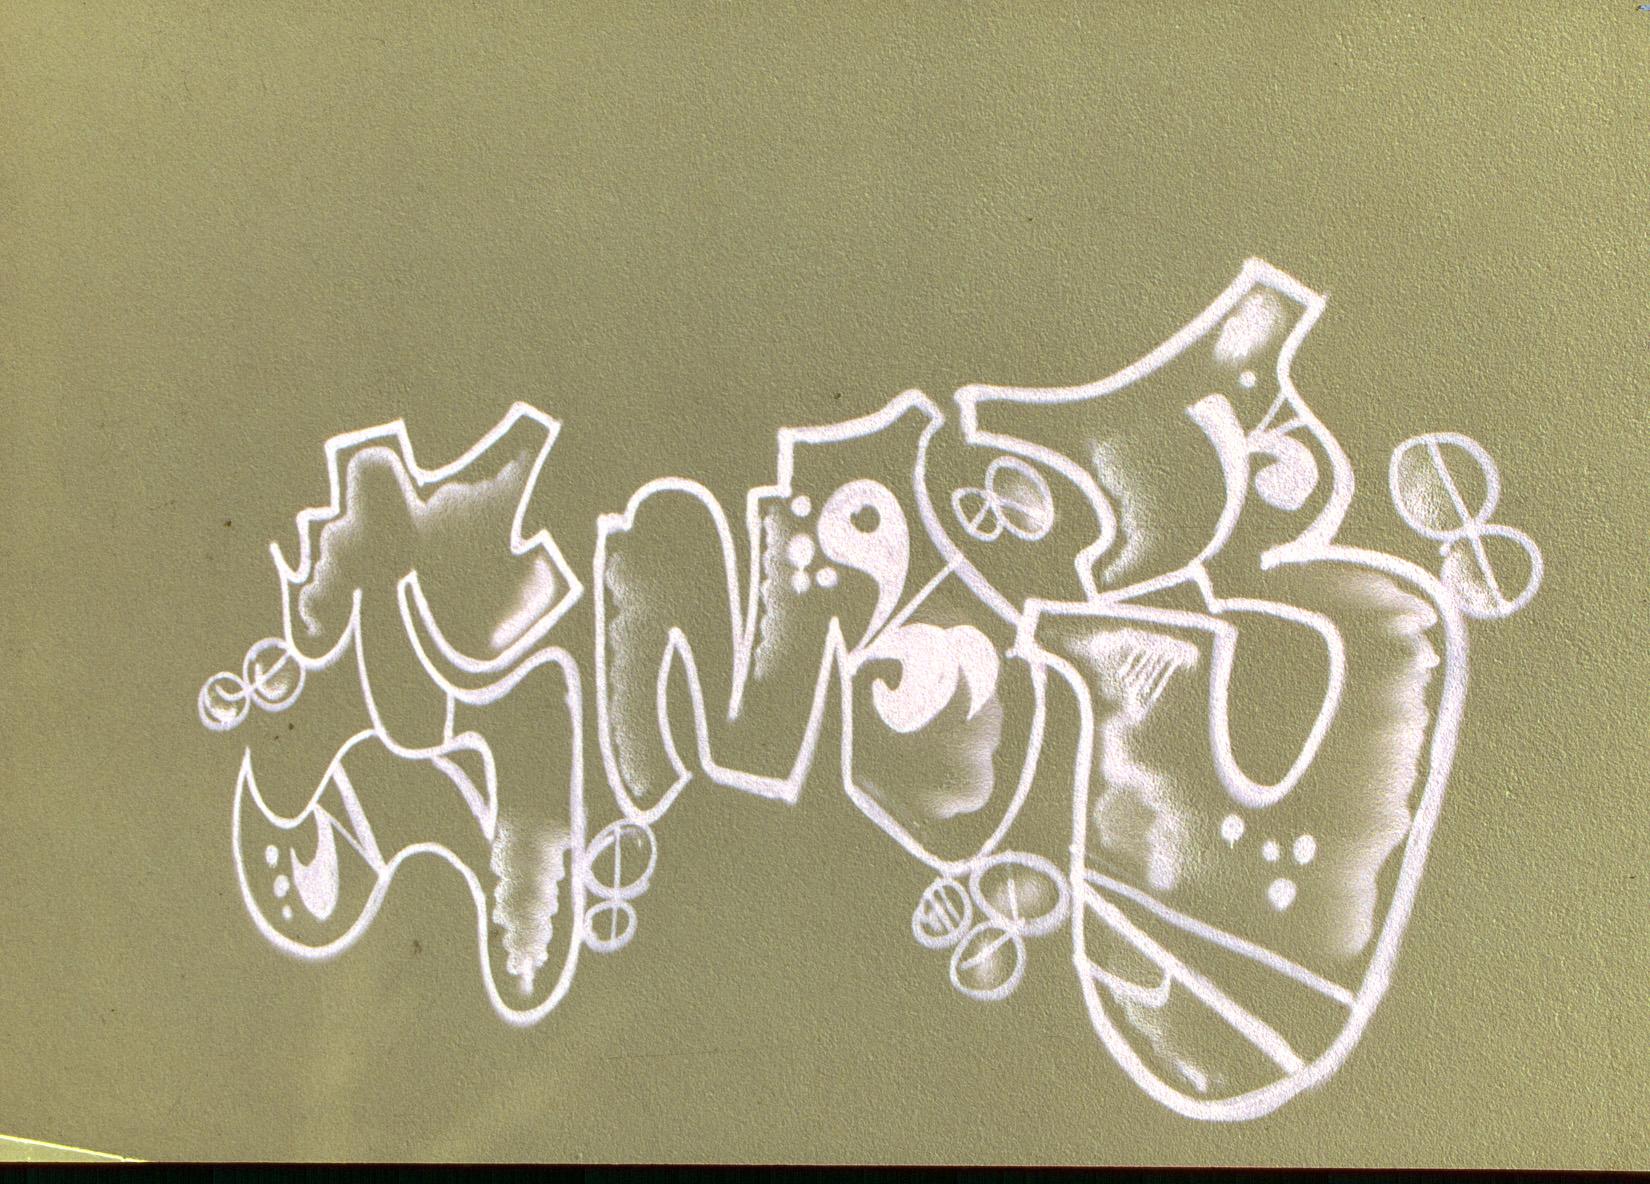 Frankfurt_Graffiti_1988_1989_H88_FRC (8 von 25)